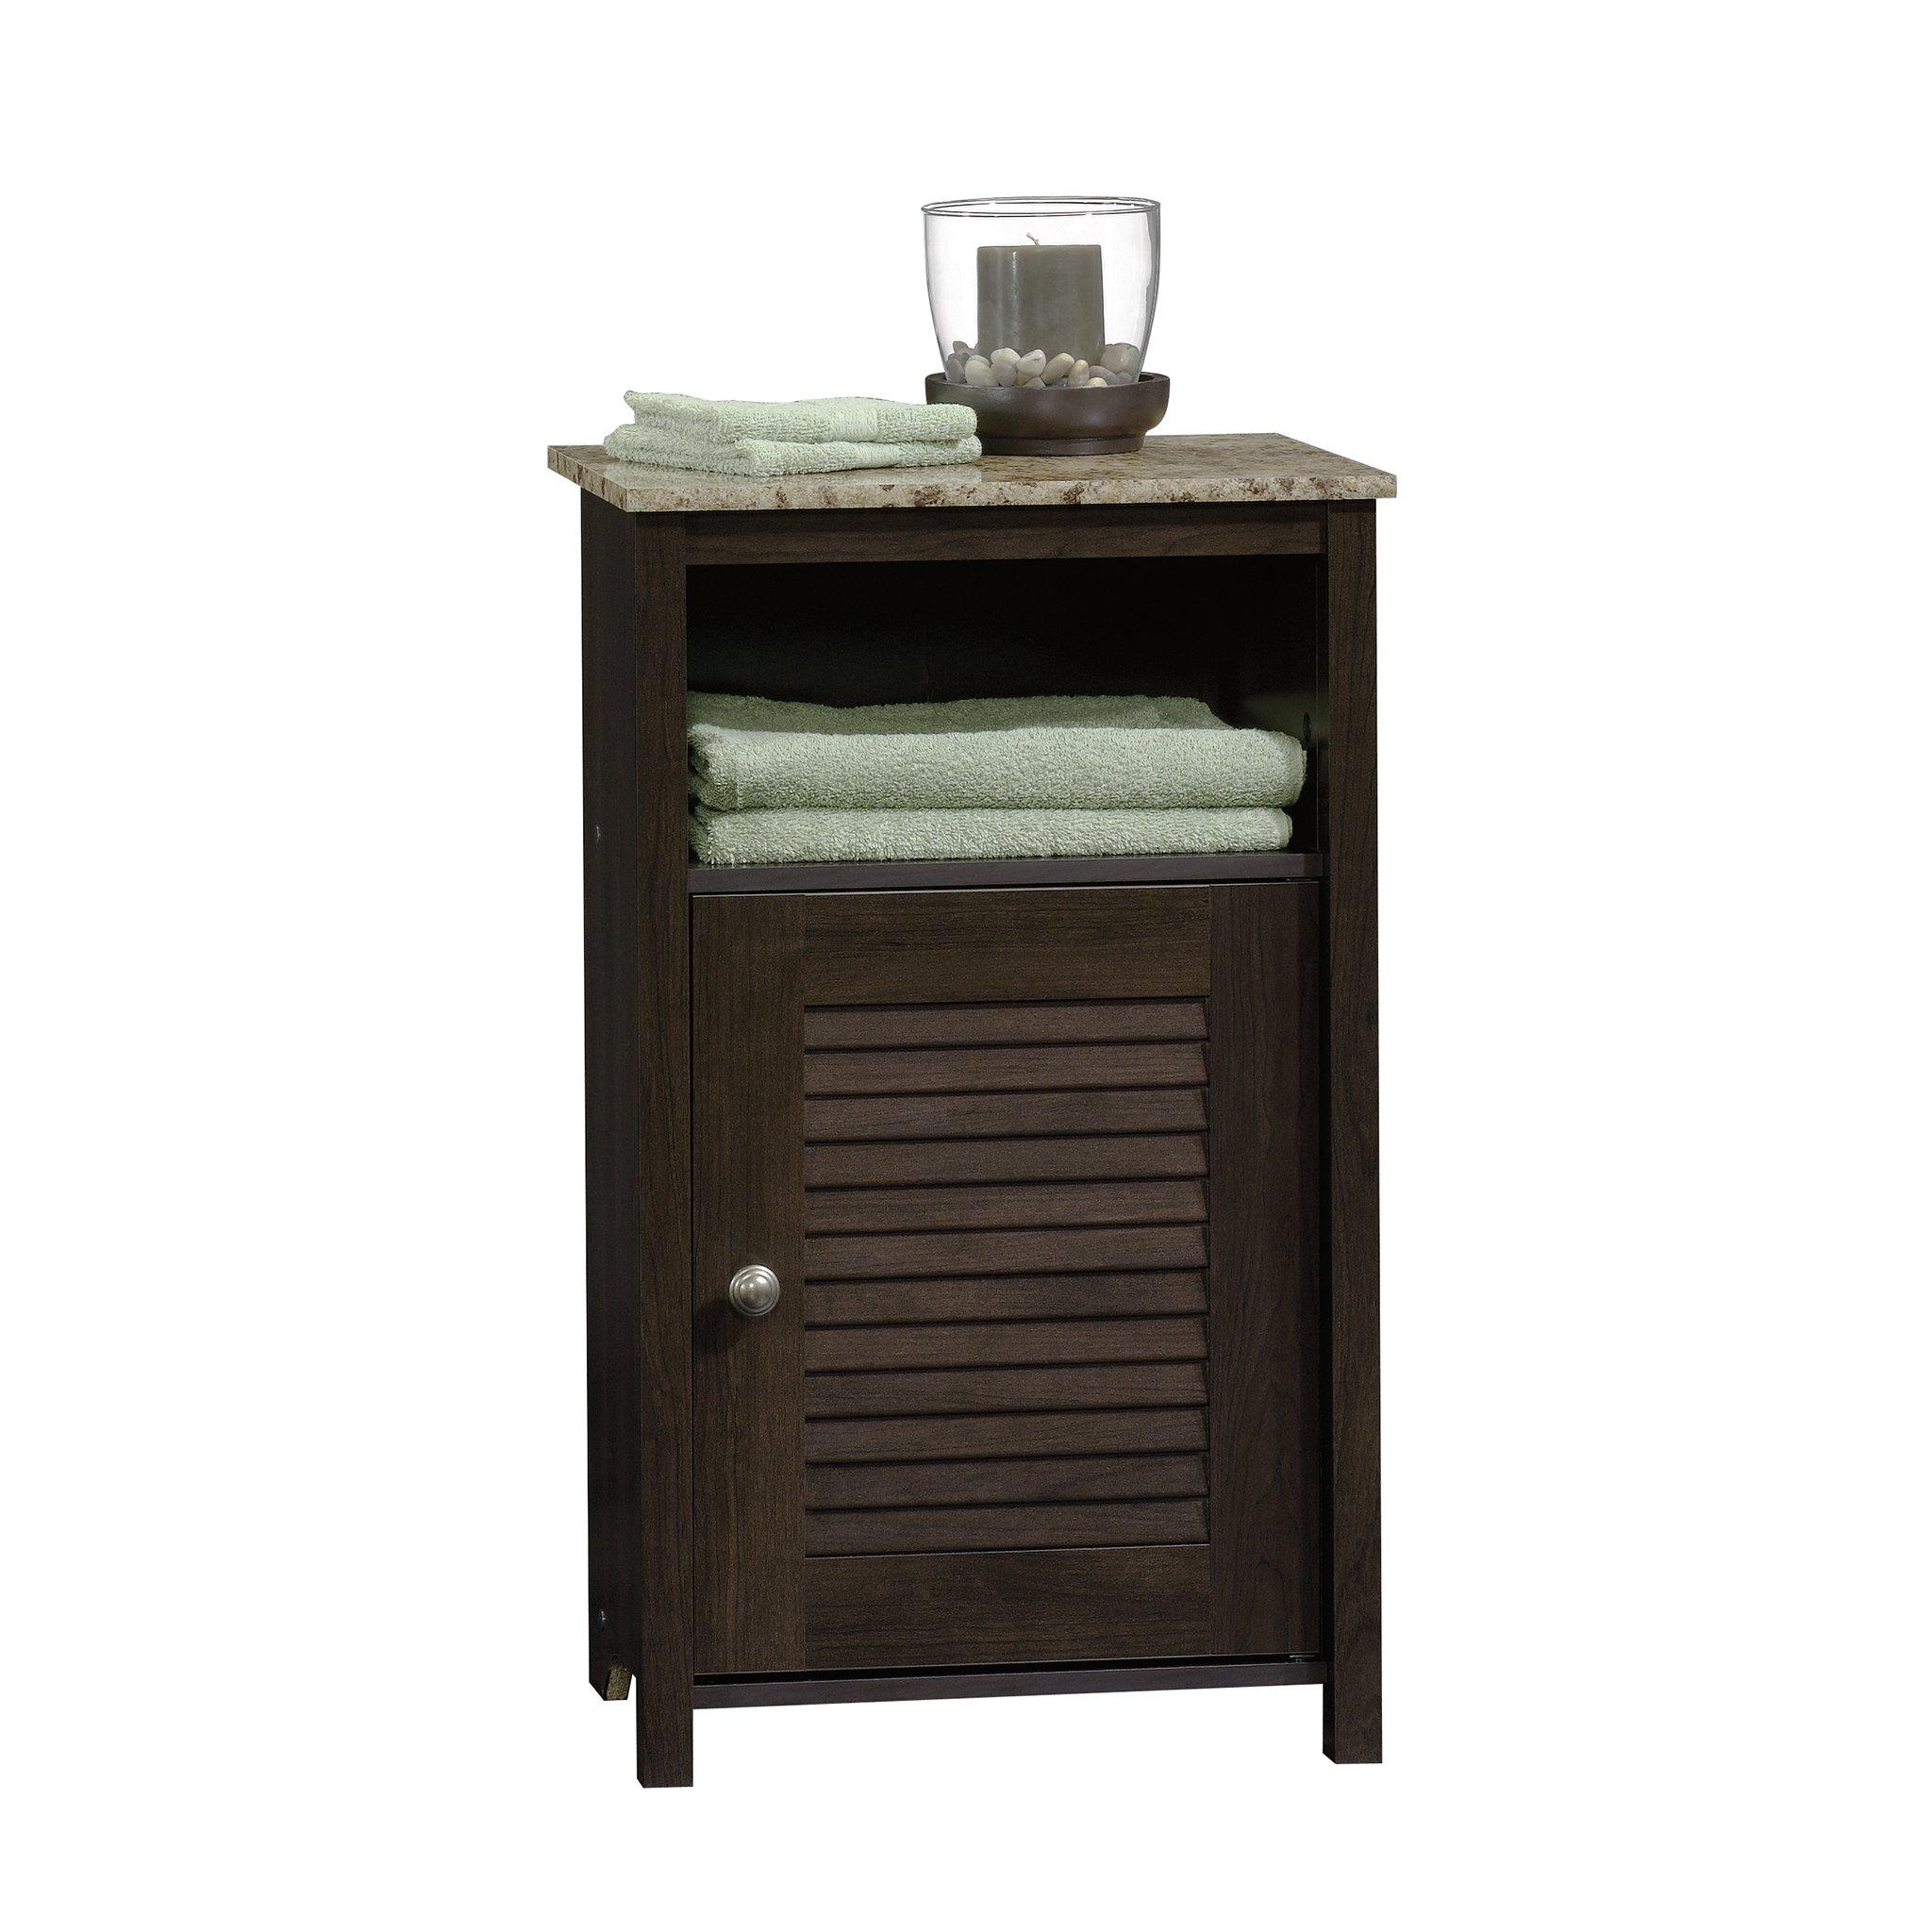 Sauder 414031 Peppercorn Floor Cabinet, L: 17.32'' x W: 11.50'' x H: 28.78'', Cinnamon Cherry finish by Sauder